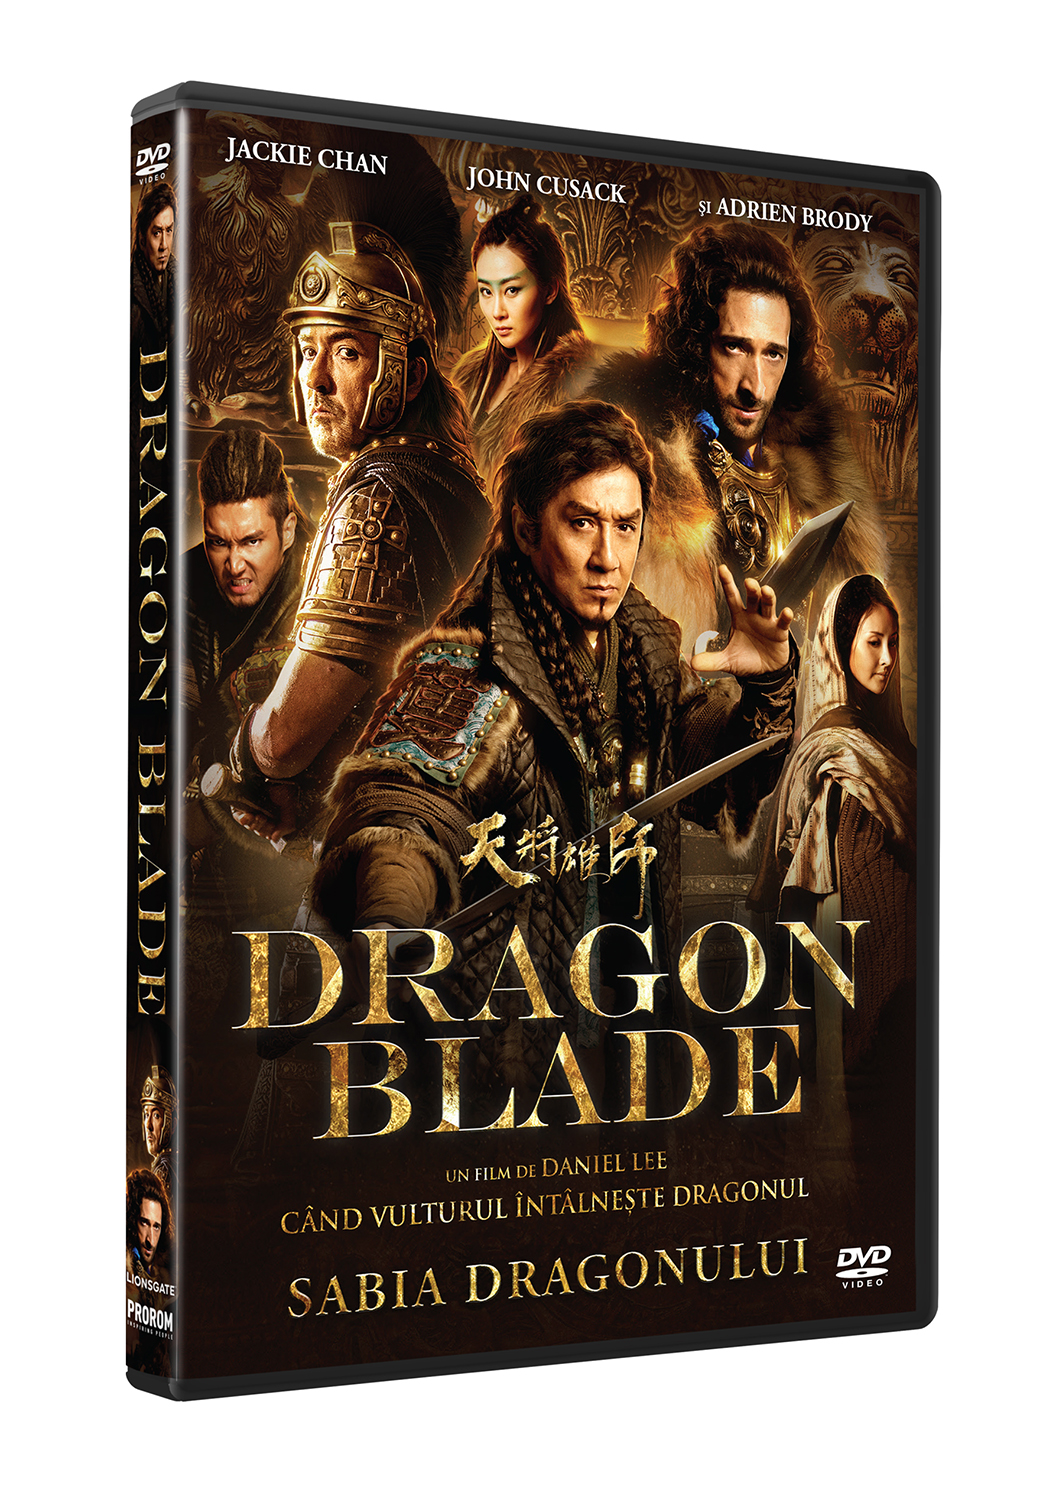 Sabia dragonului / Dragon Blade